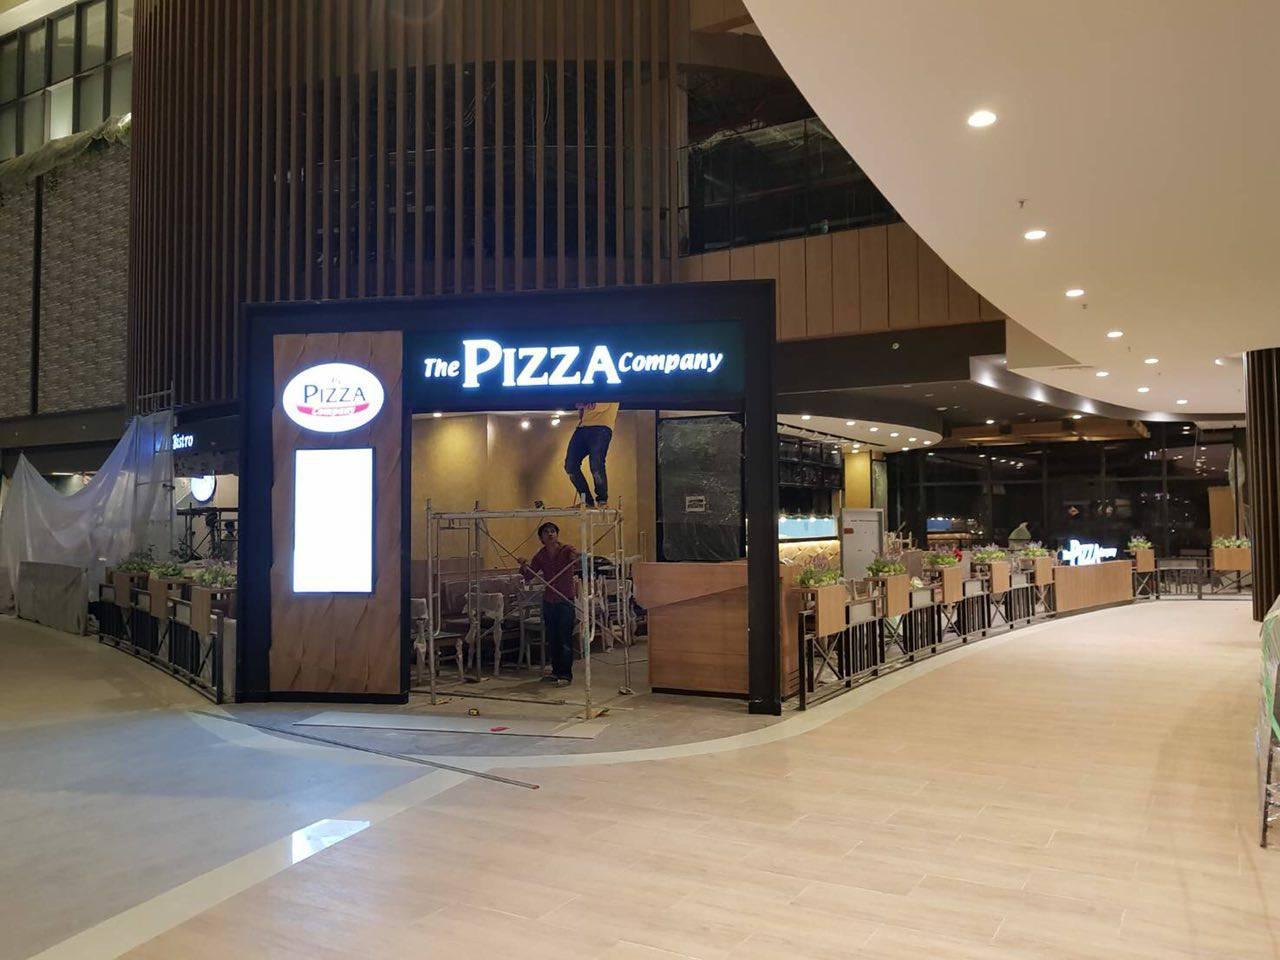 The Pizza Company នឹងបើកដំនើរការឆាប់ៗនេះហើយនៅ AEON សែនសុខ